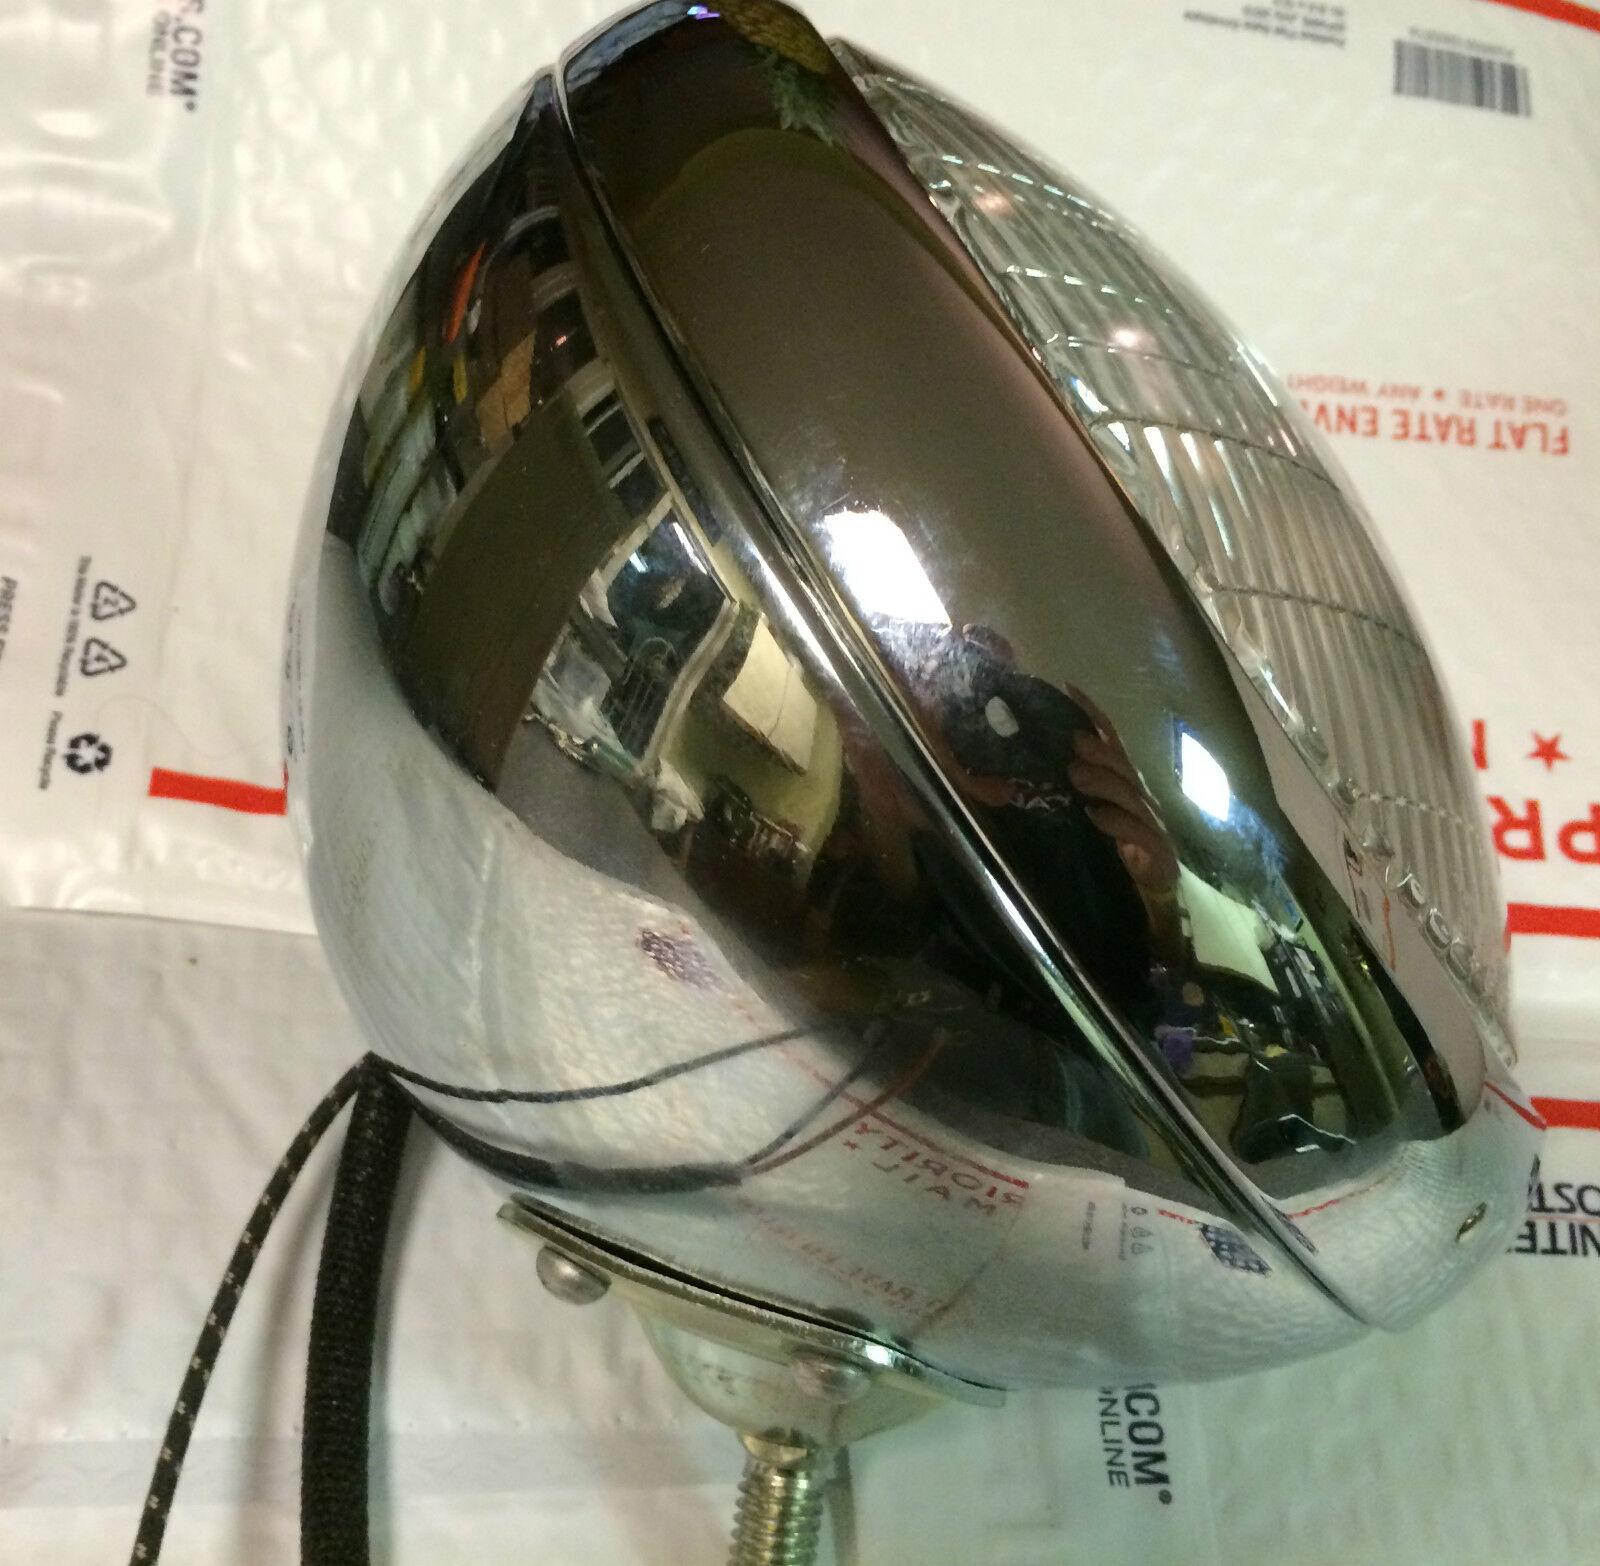 Harley Panhead Hydra-Glide Guide Cycle-Beam Headlamp 1949-59 ... on harley dash kit, harley stator wiring, harley banjo bolt, harley trunk latch, harley wiring kit, harley wiring tools, harley clutch rod, harley wiring color codes, harley clutch diaphragm spring, harley headlight adapter, harley tow bar, harley choke lever, harley motorcycle stereo amplifier, harley headlight harness, harley belly pan, harley crankcase, harley dash wiring, harley timing chain, harley wiring connectors, harley bluetooth interface,